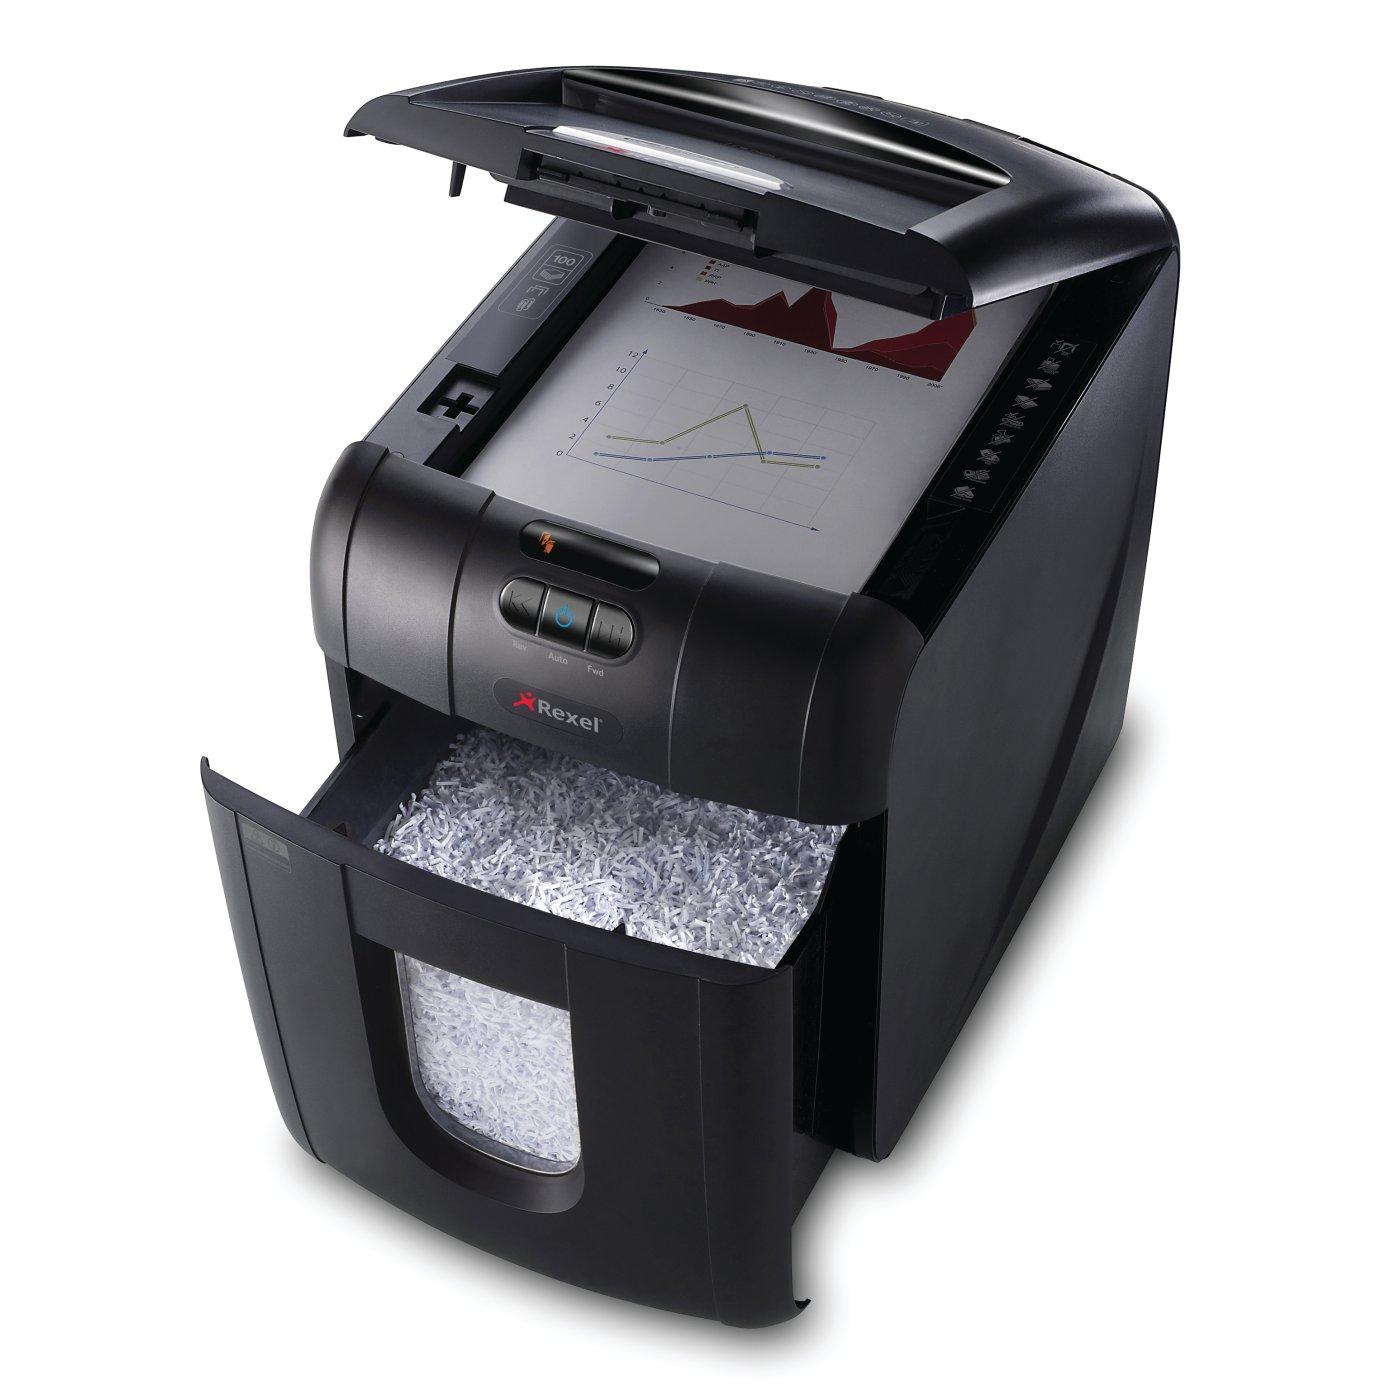 Shredders Home And Office Rexel Auto 100m Shredder